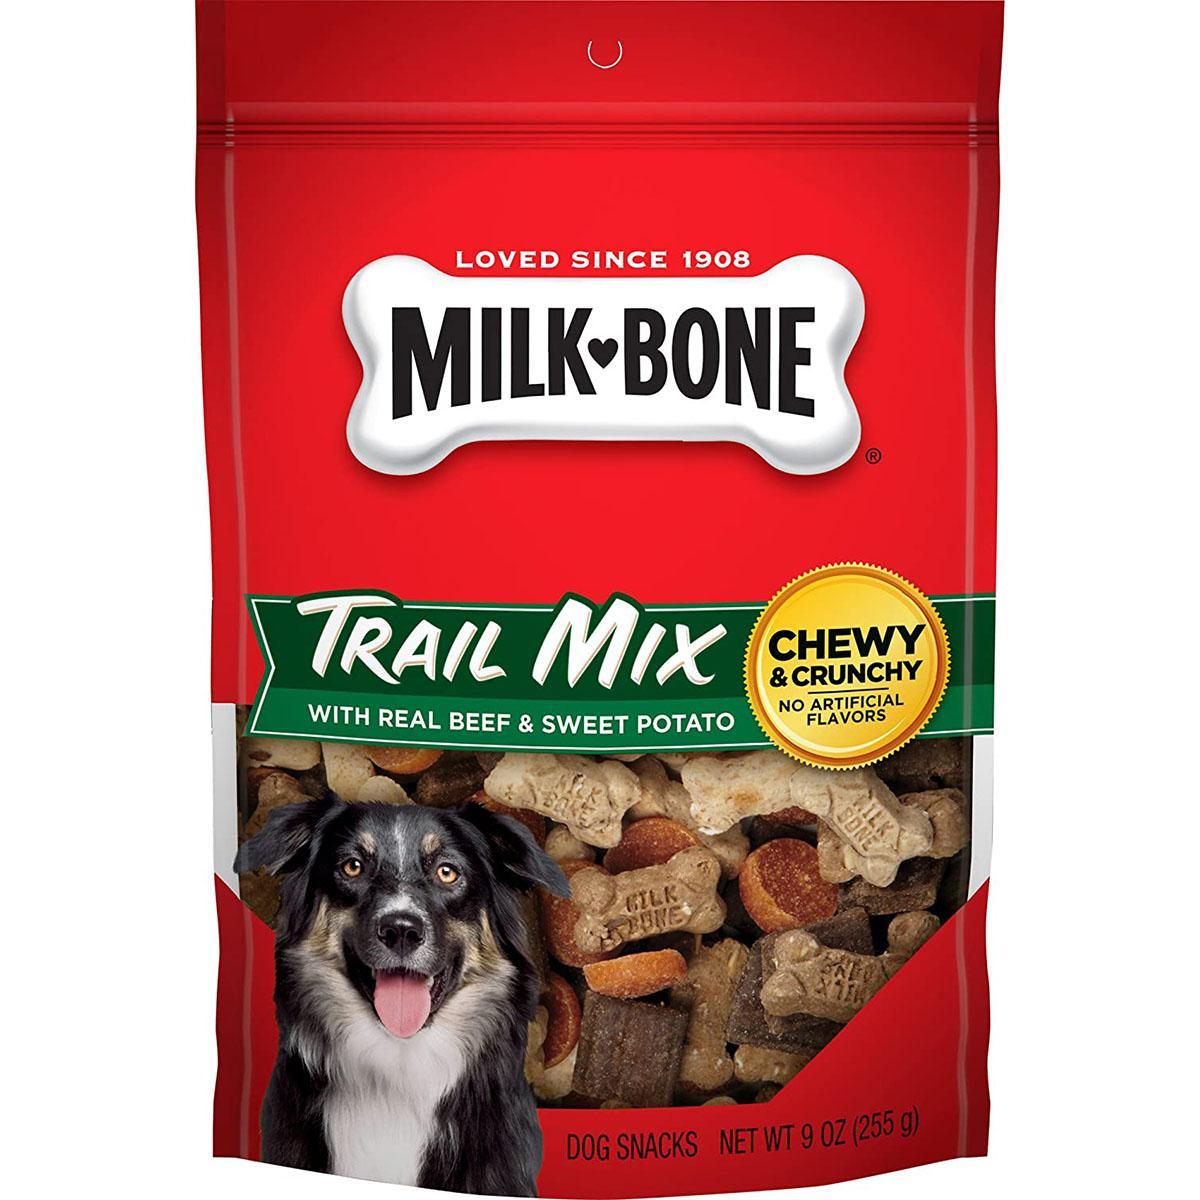 Milk-Bone Trail Mix with Real Beef & Sweet Potato Dog Treats